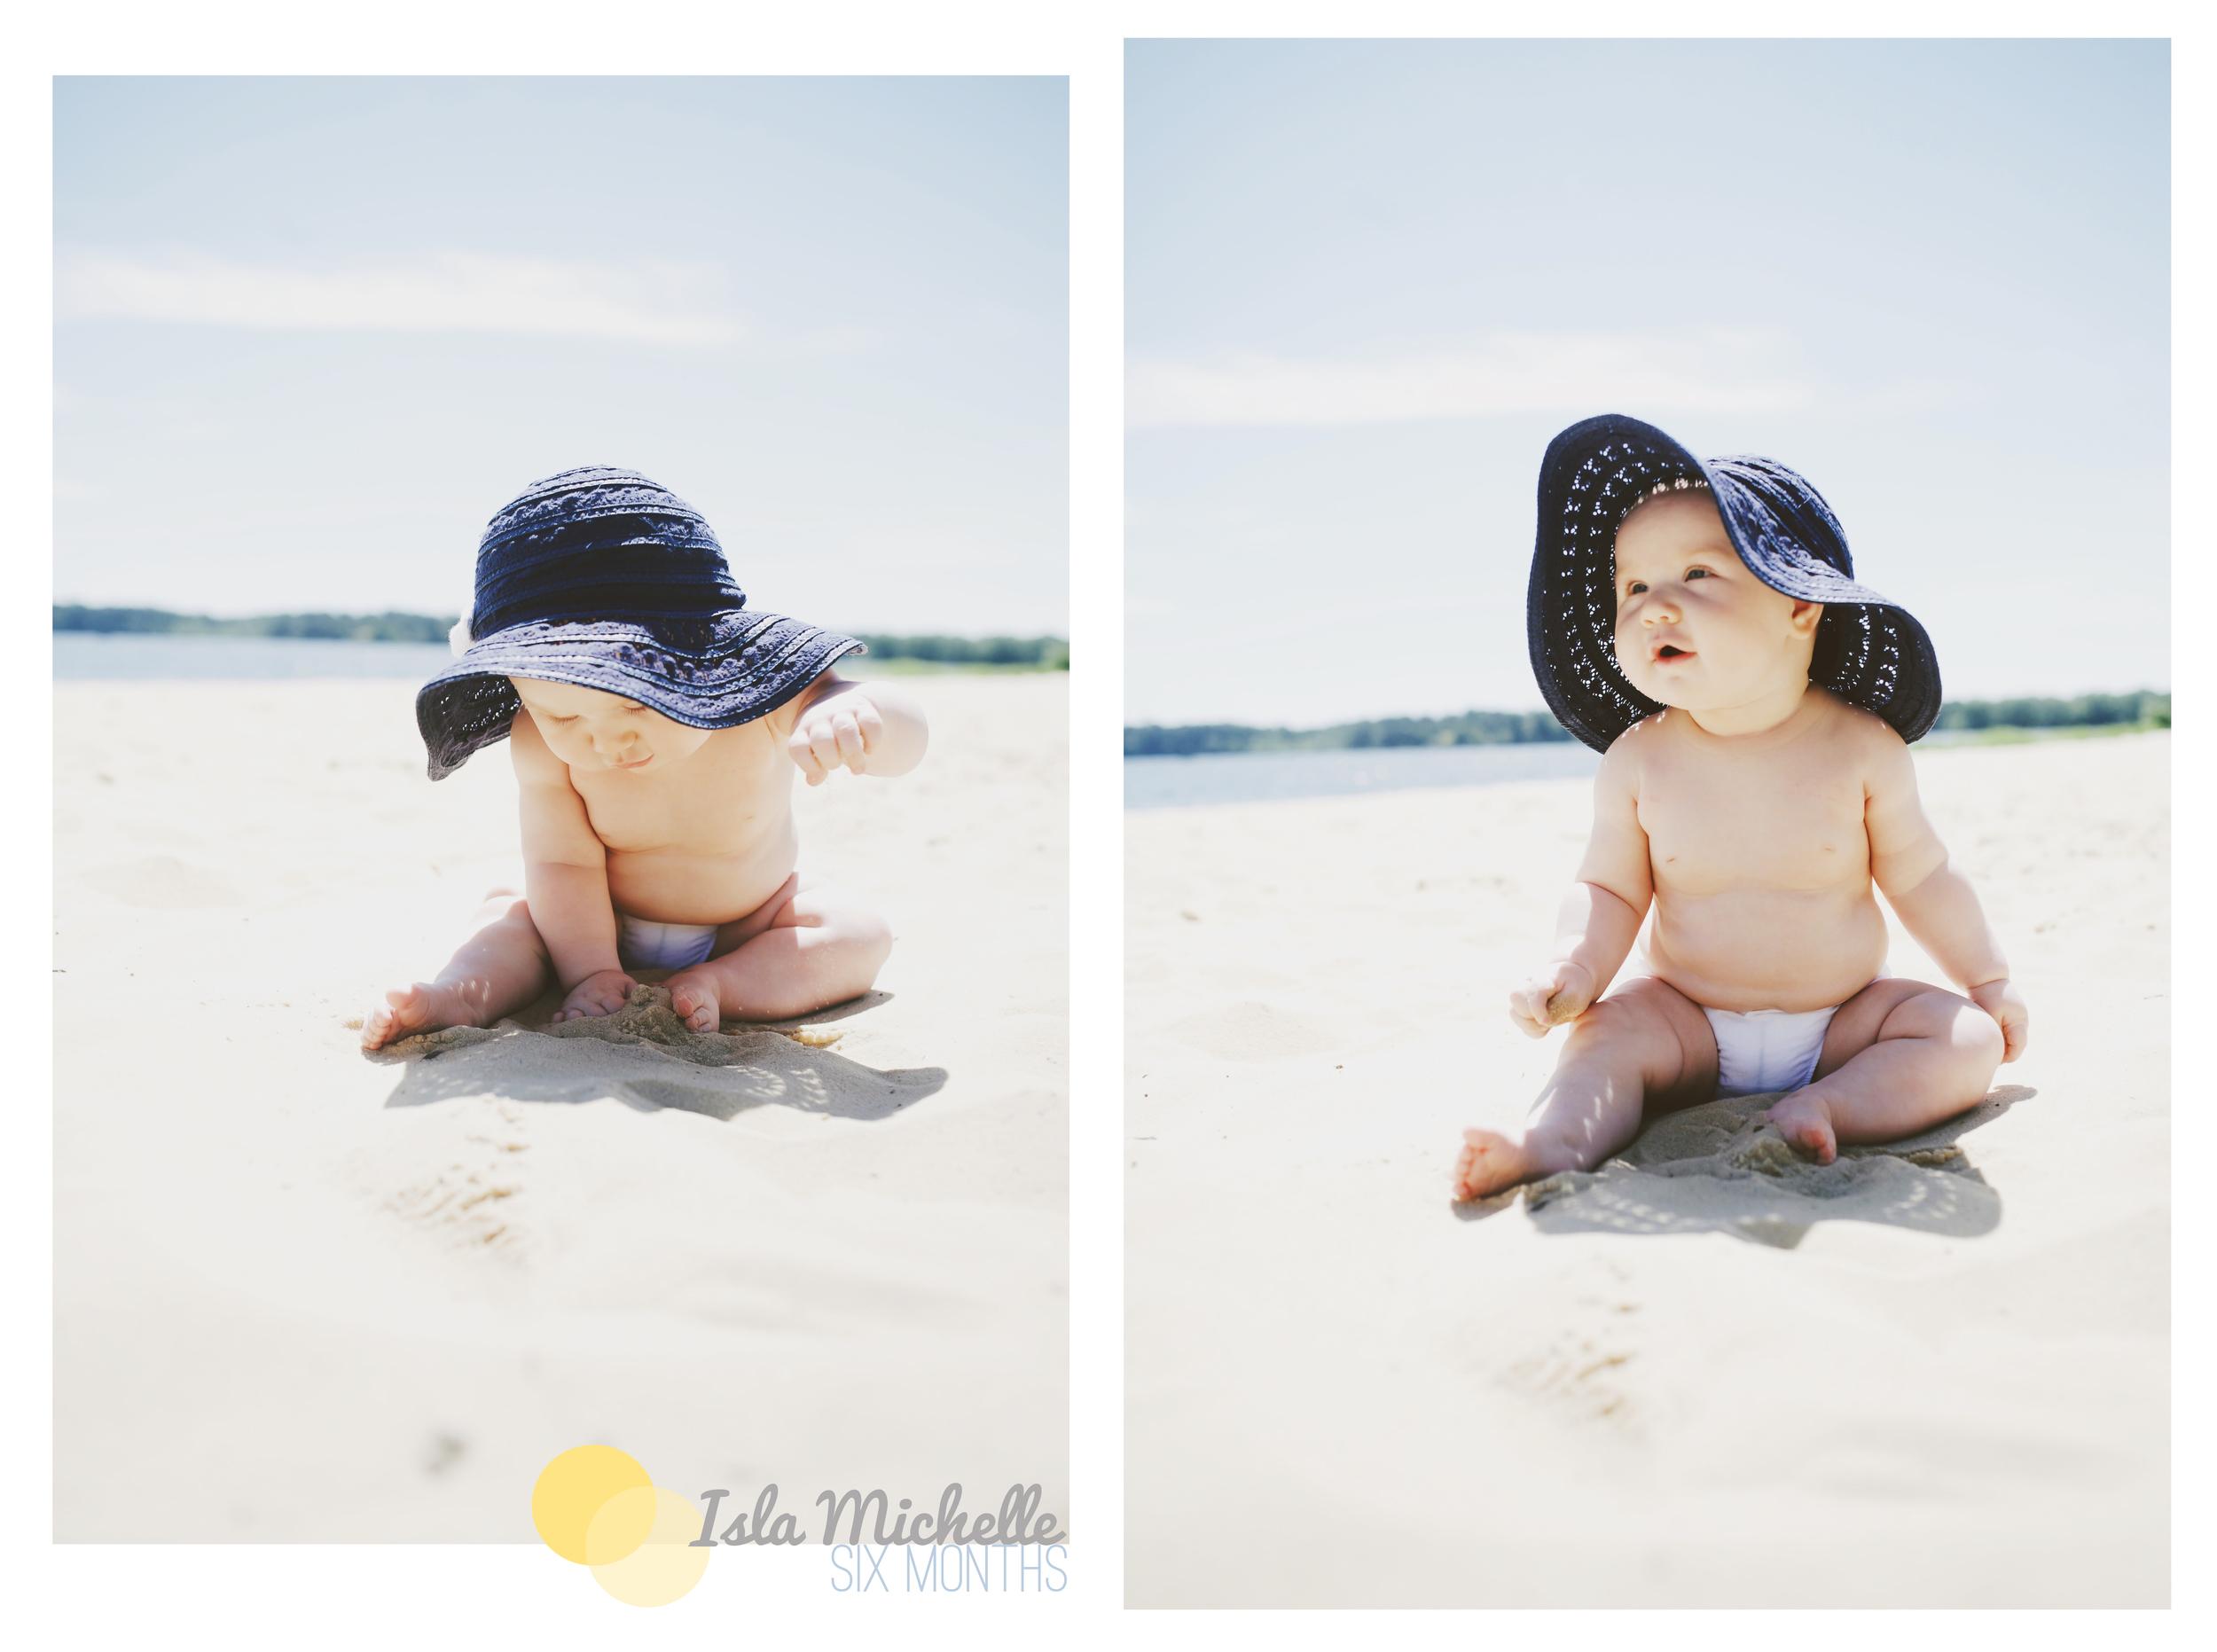 Untitled-beach copy.jpg